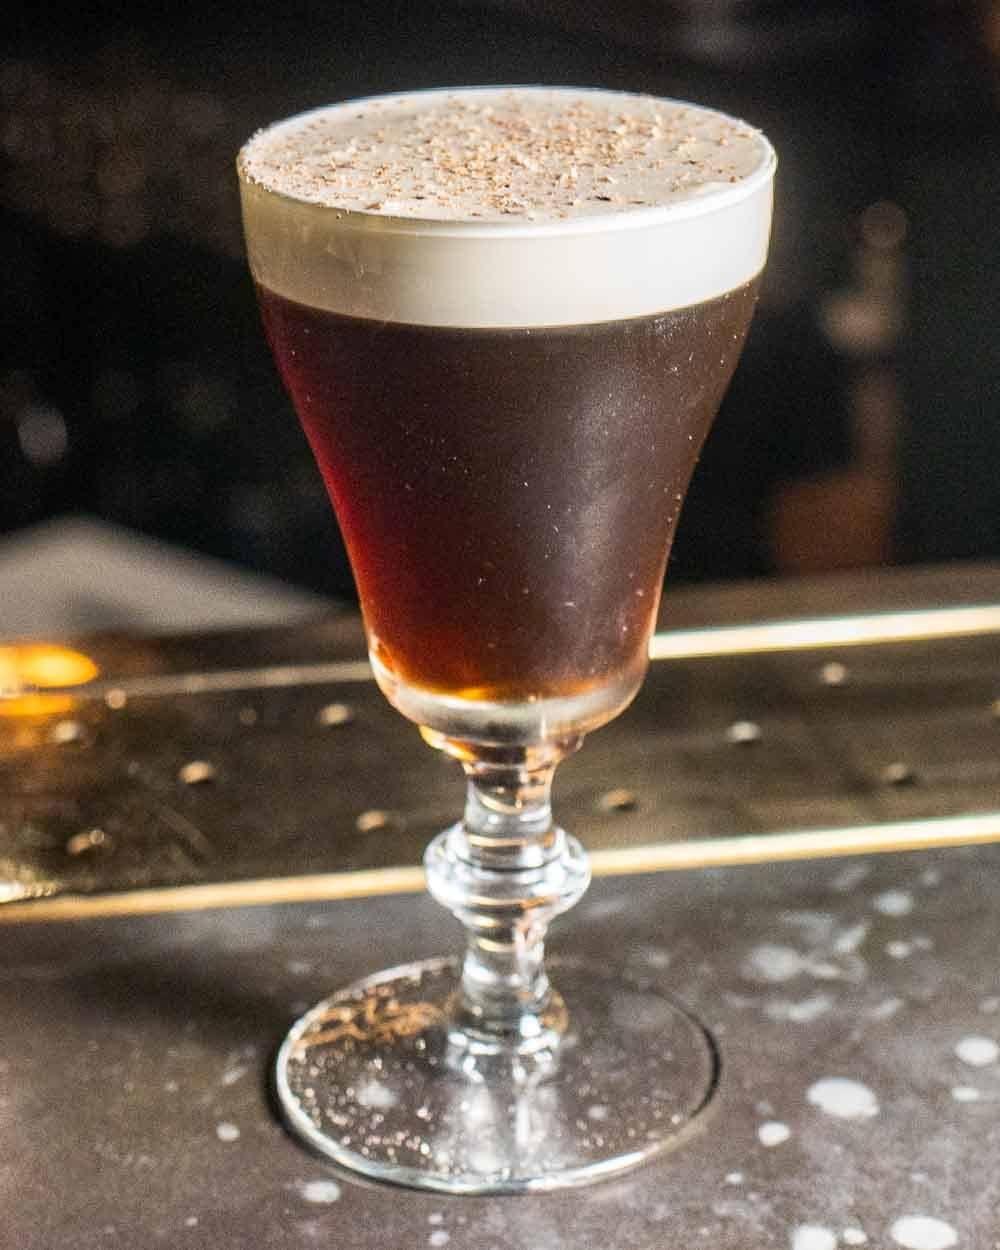 Belfast Coffee at Bar 1661 in Dublin